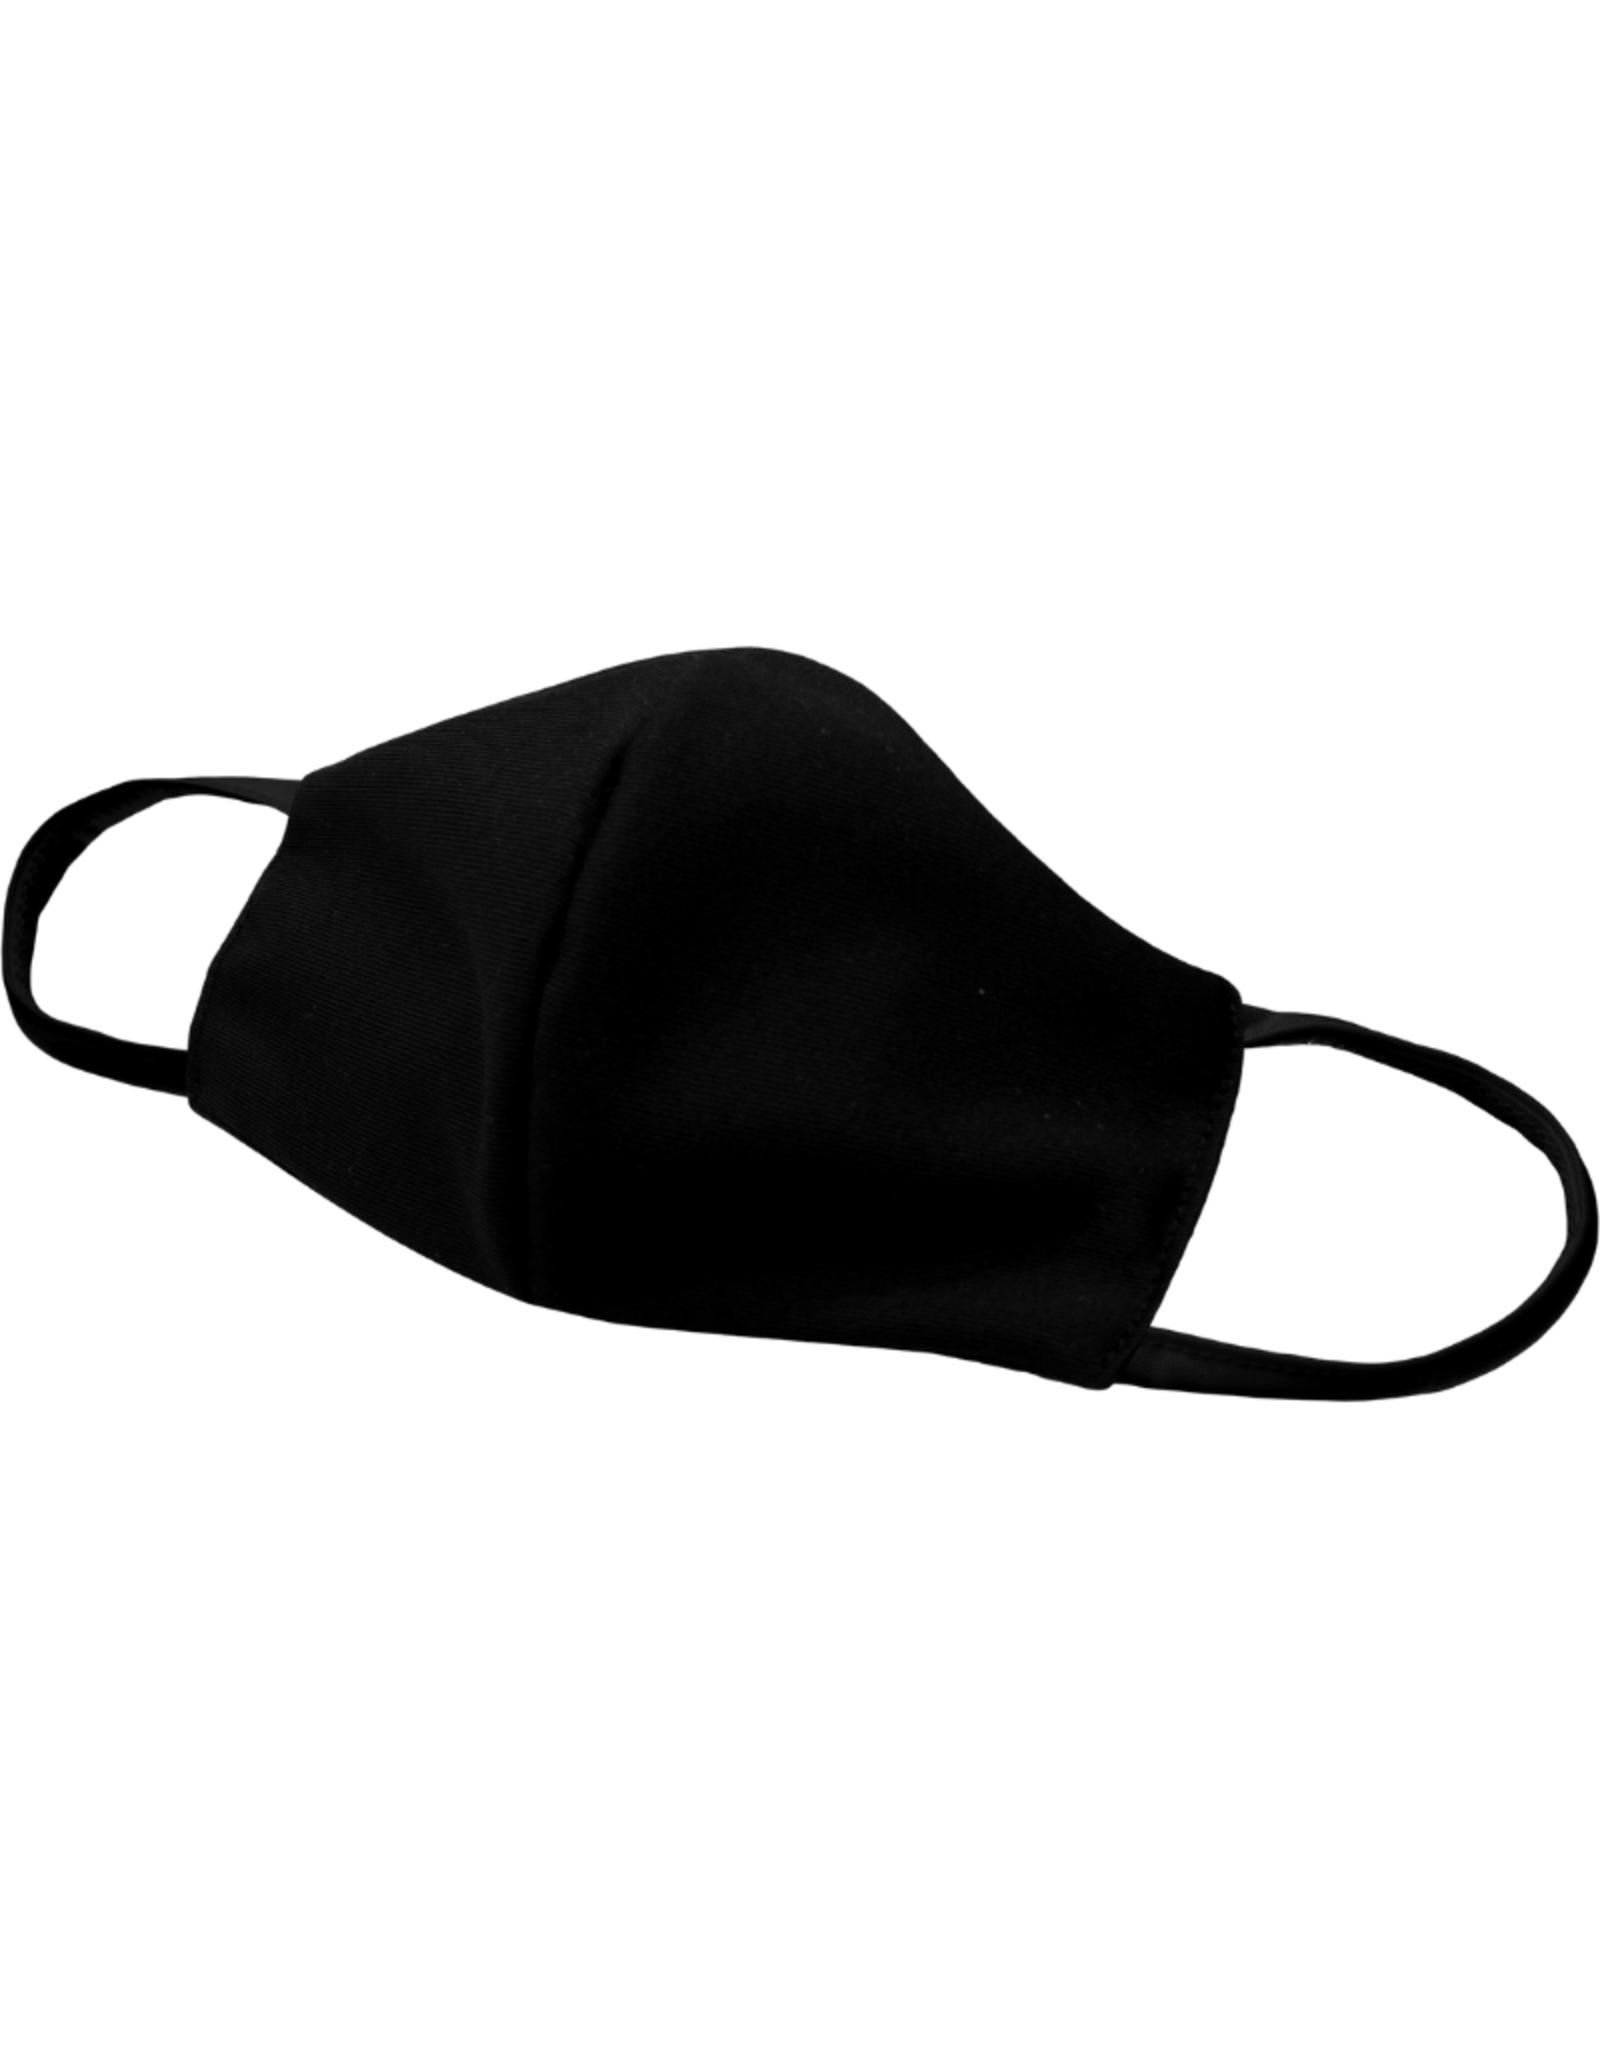 AK Reusable Fabric Face Mask Black